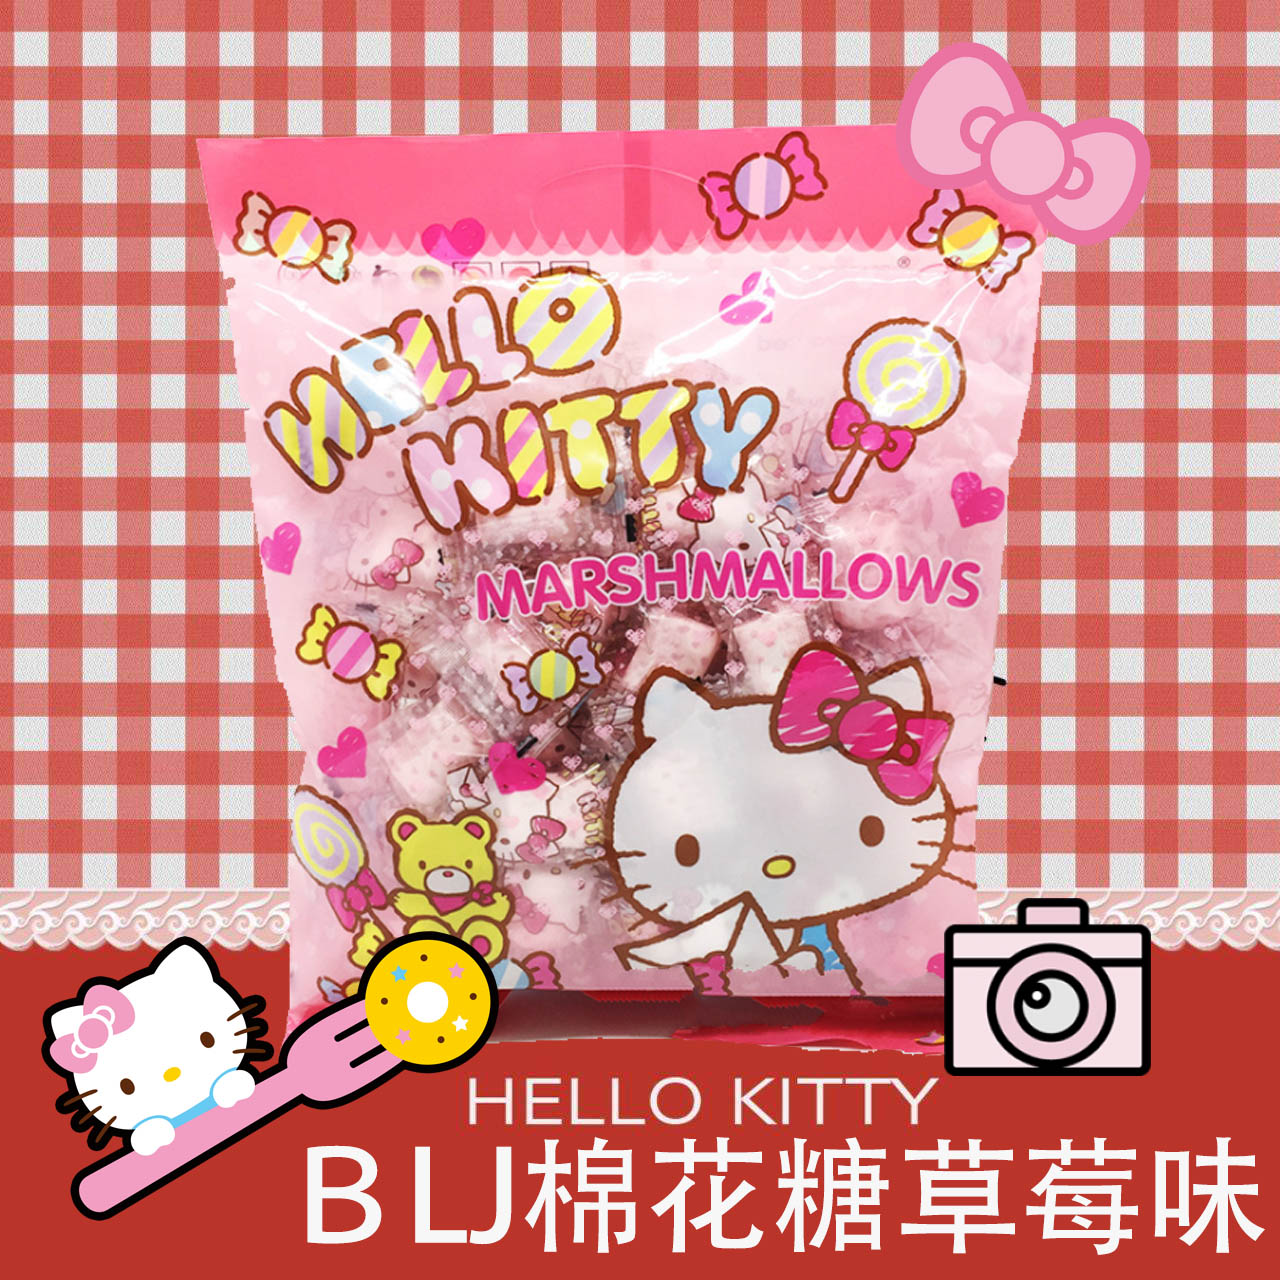 BLJ棉花糖草莓味180g 大包独立装hello kitty棉花糖 休闲零食糖果